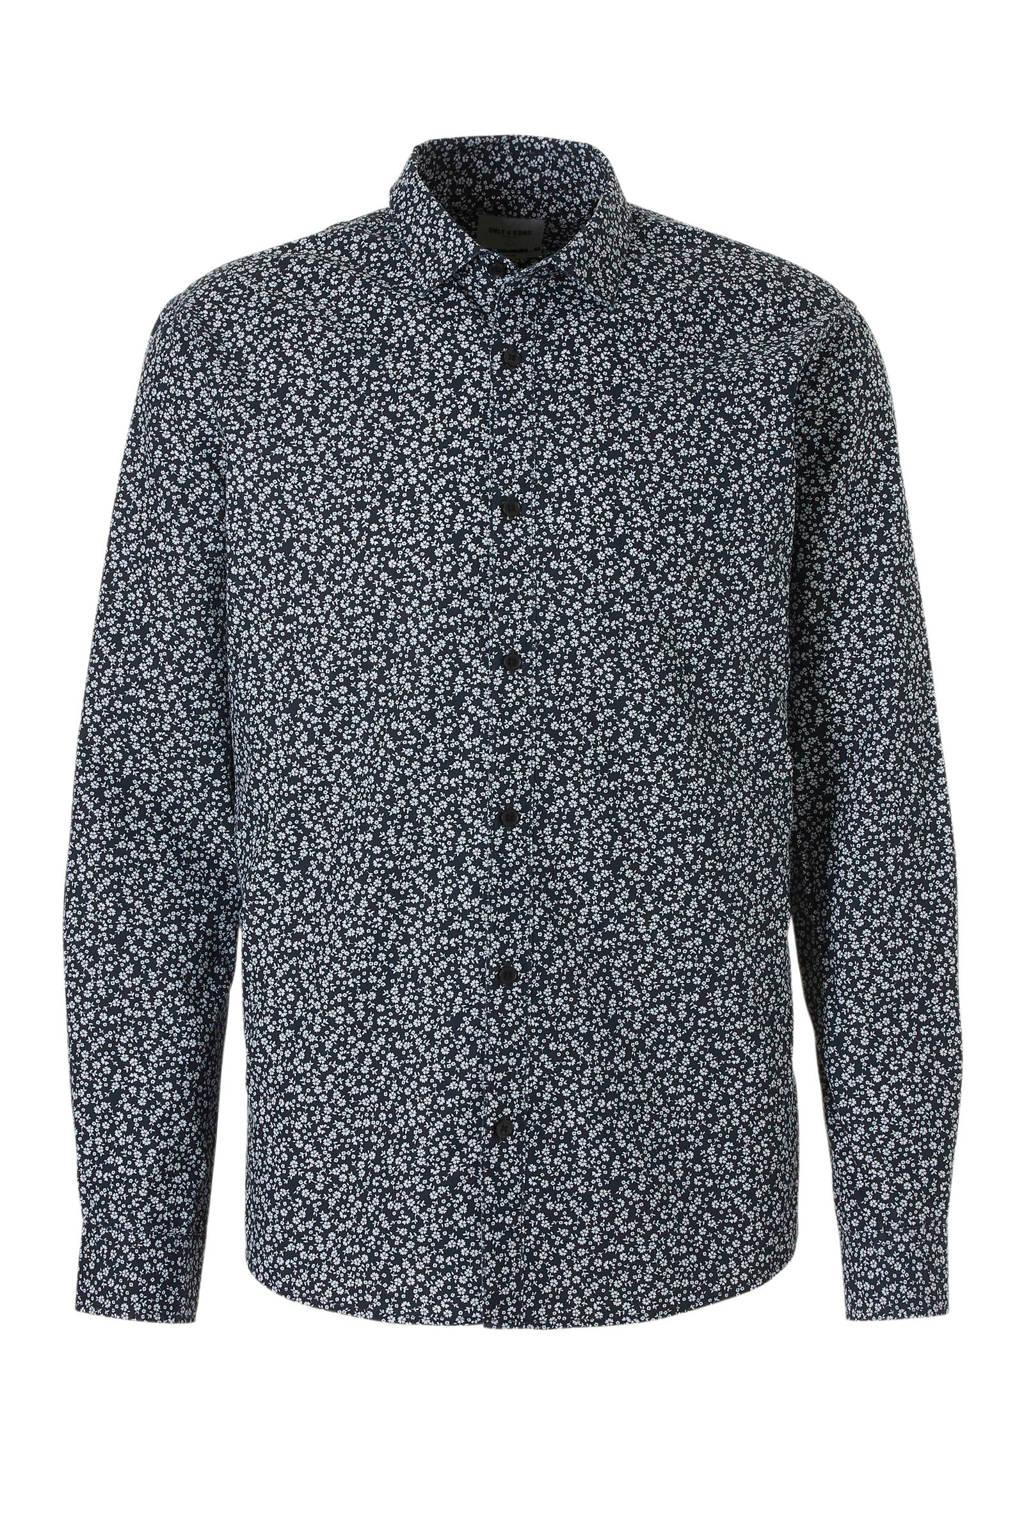 Only & Sons slim fit overhemd, Zwart